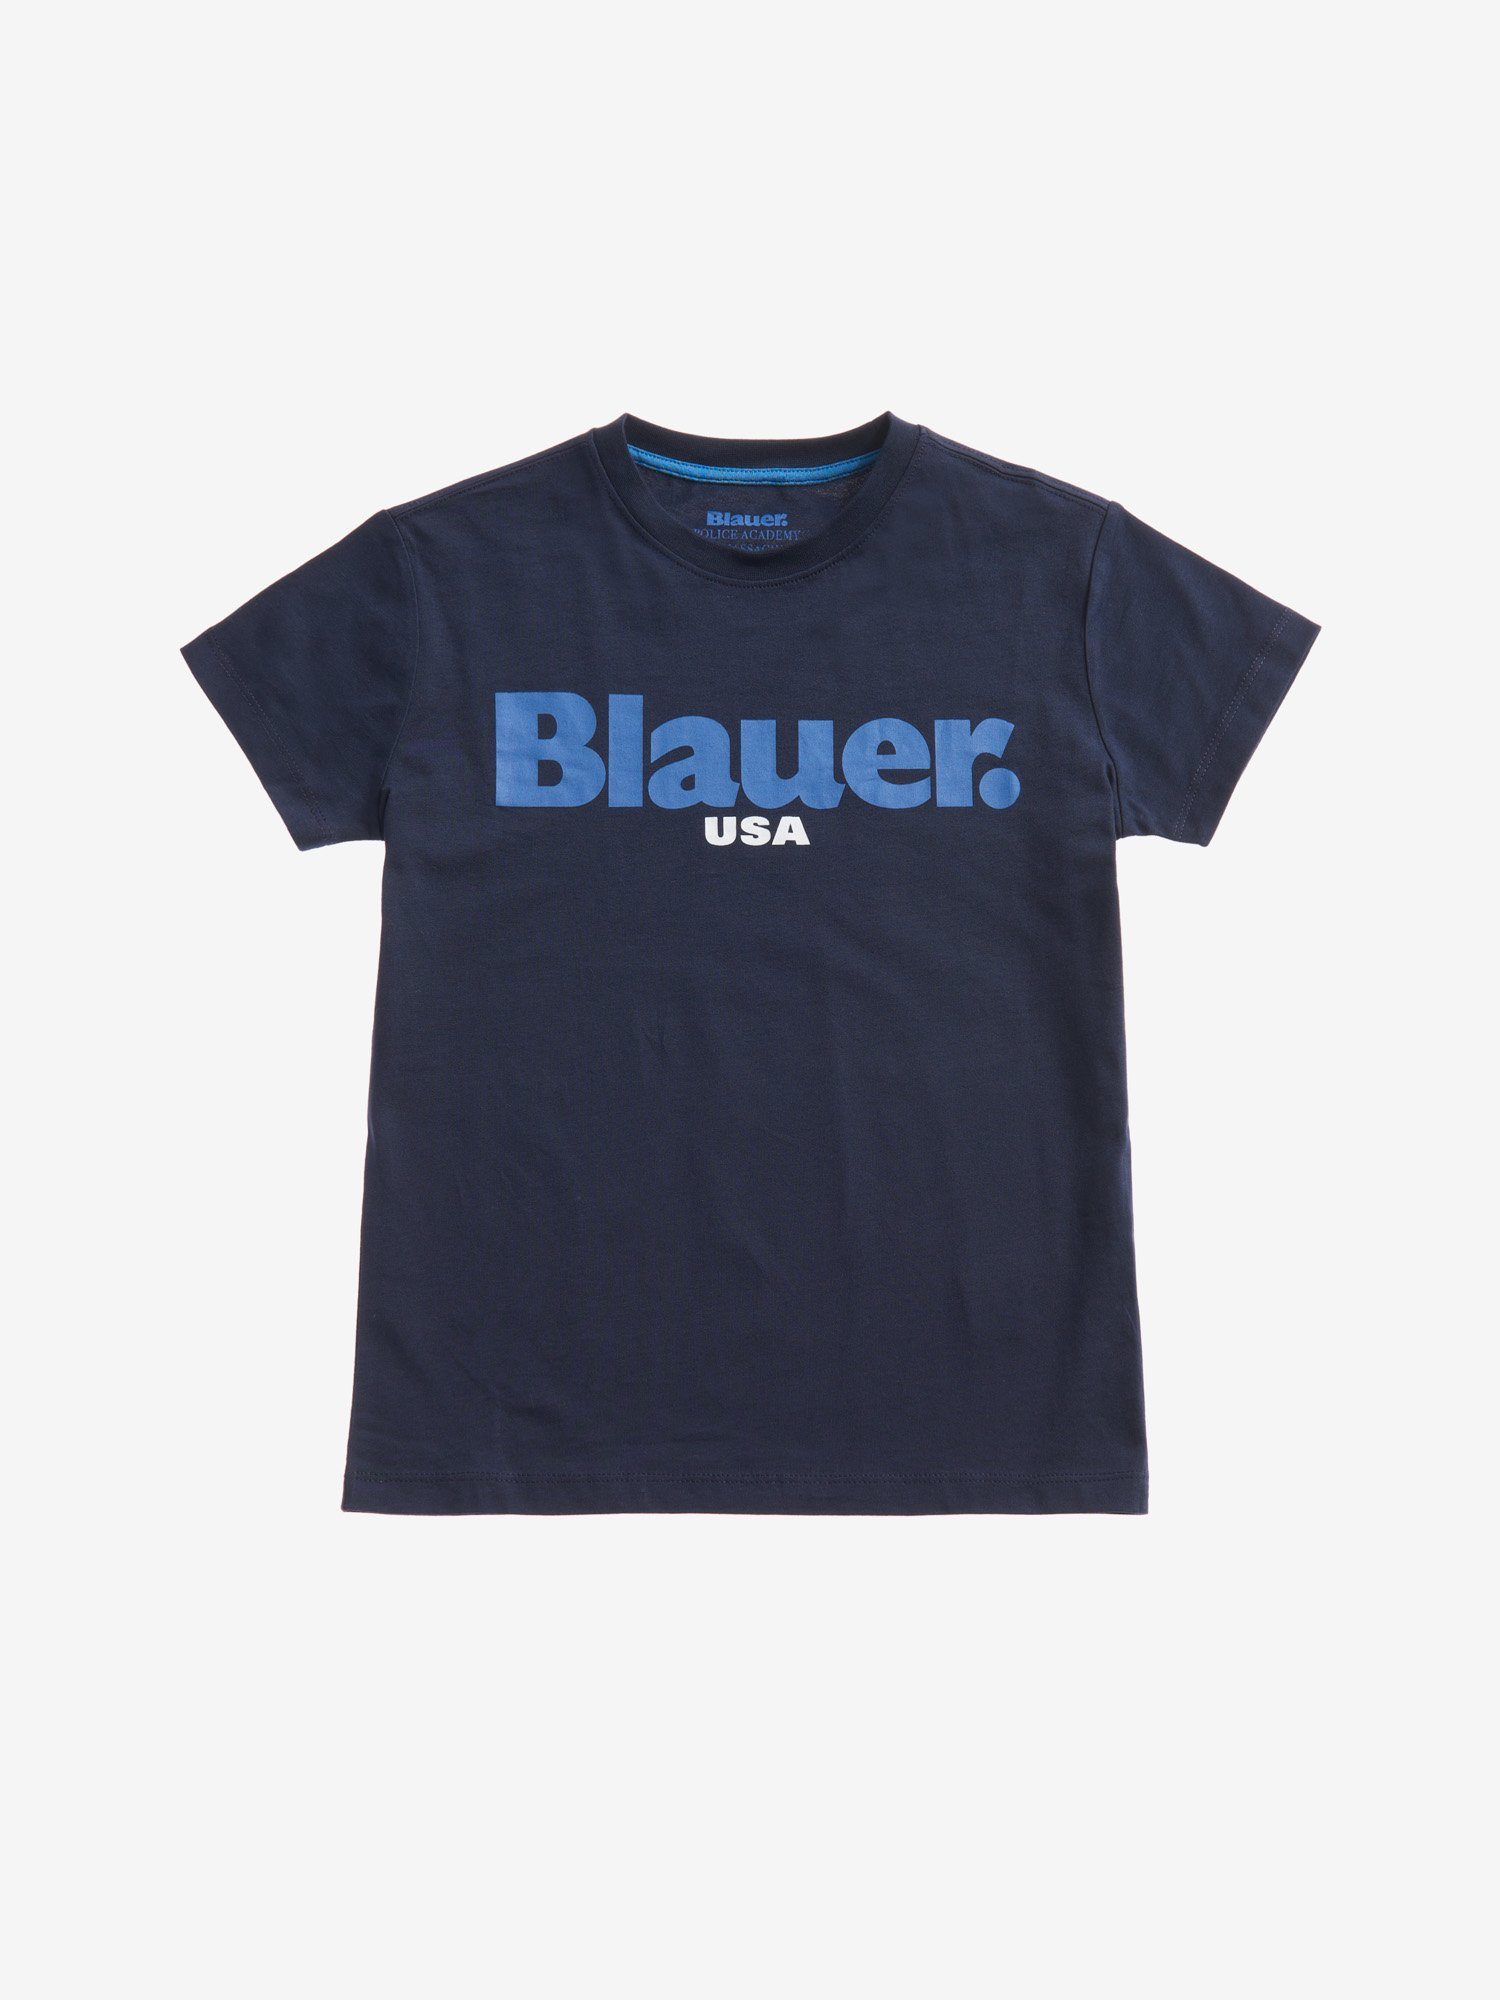 CAMISETA NIÑO BLAUER USA - Blauer